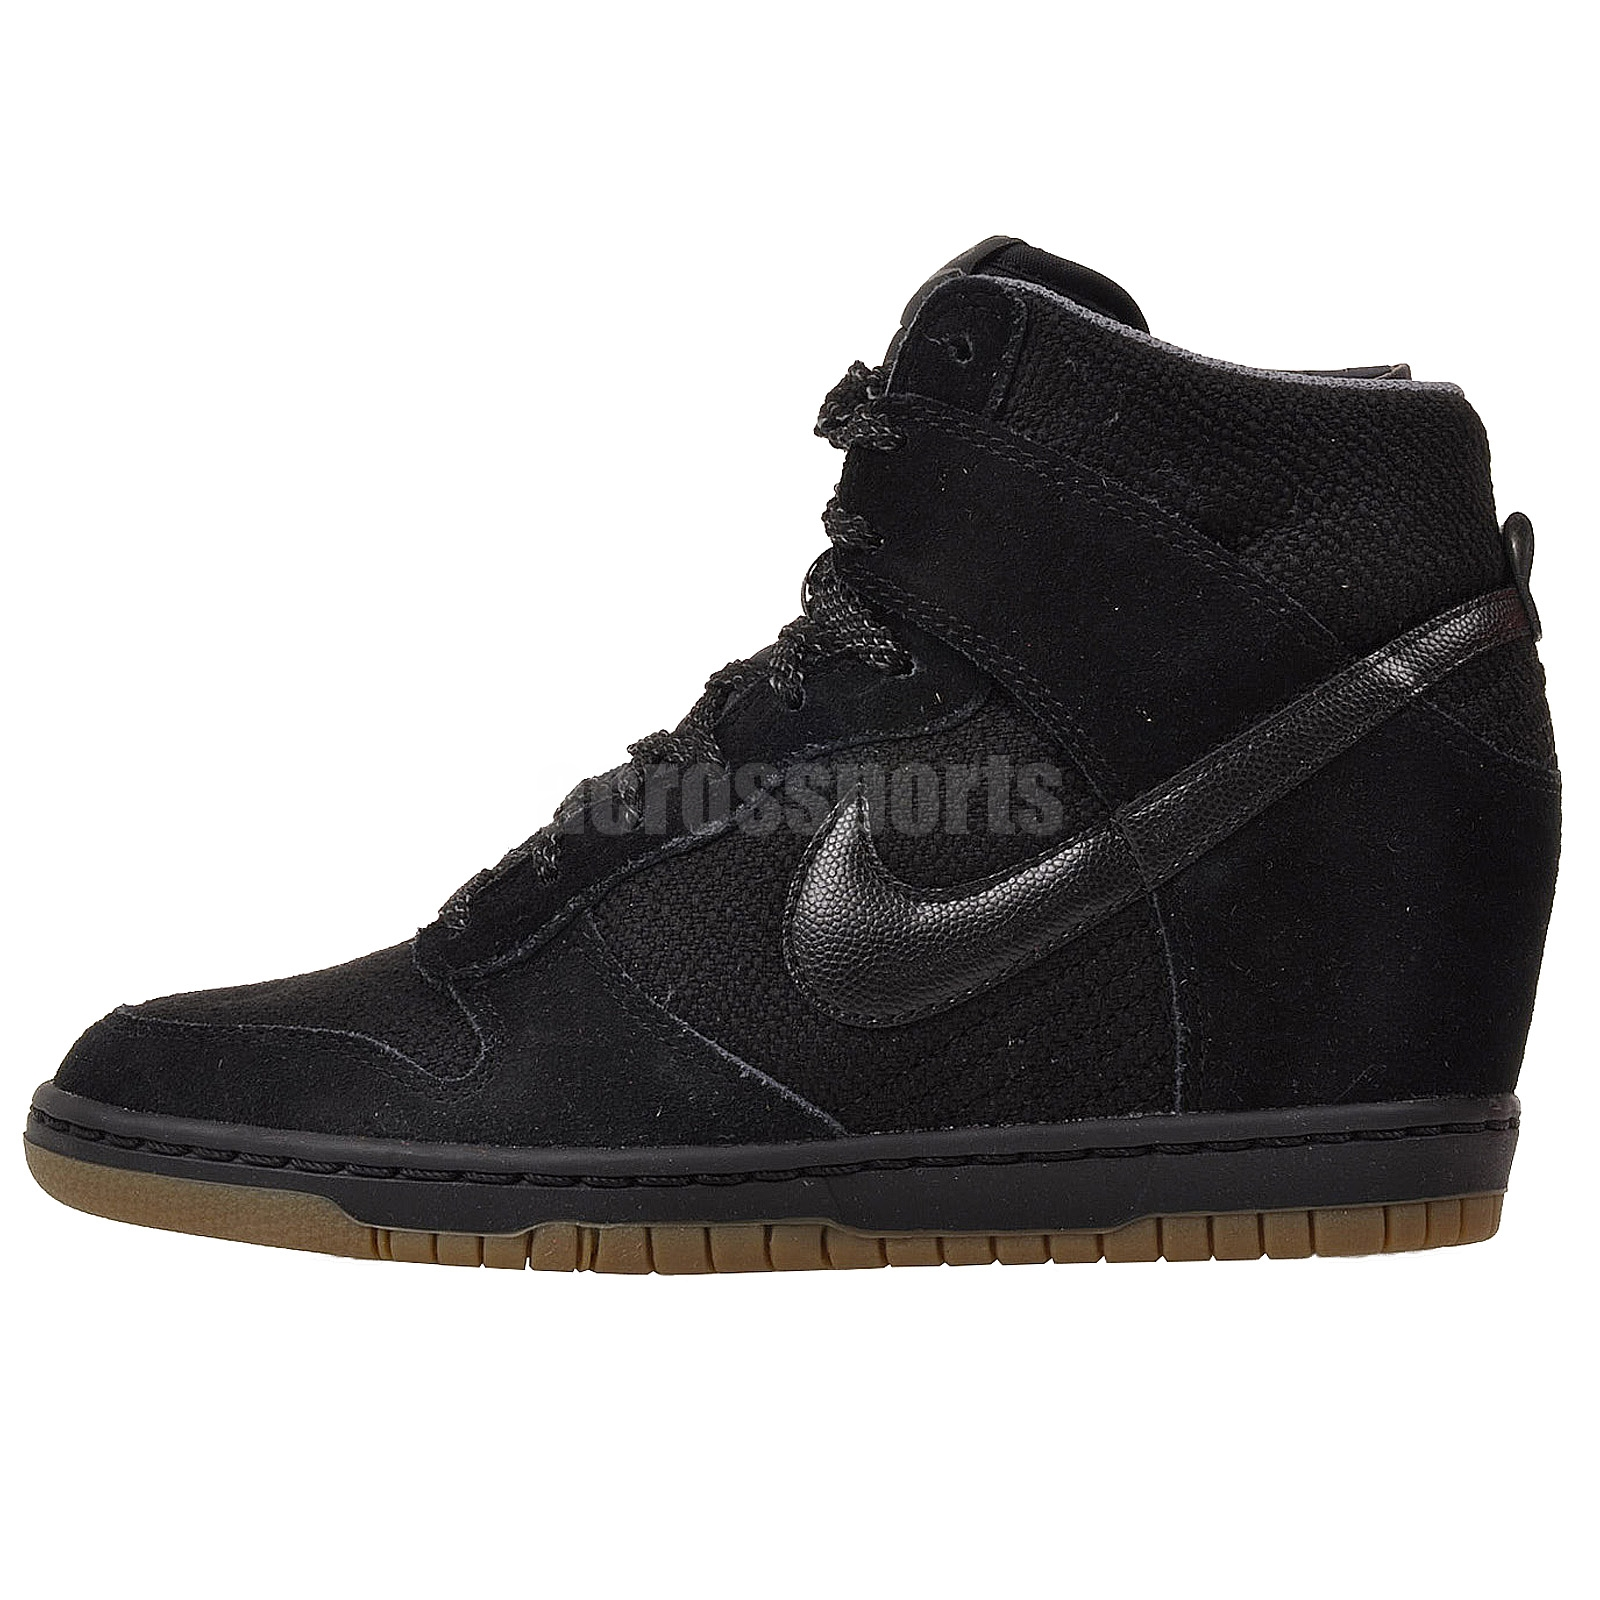 Nike Wmns Dunk Sky Hi Essential Black Womens Fashion Wedge ...